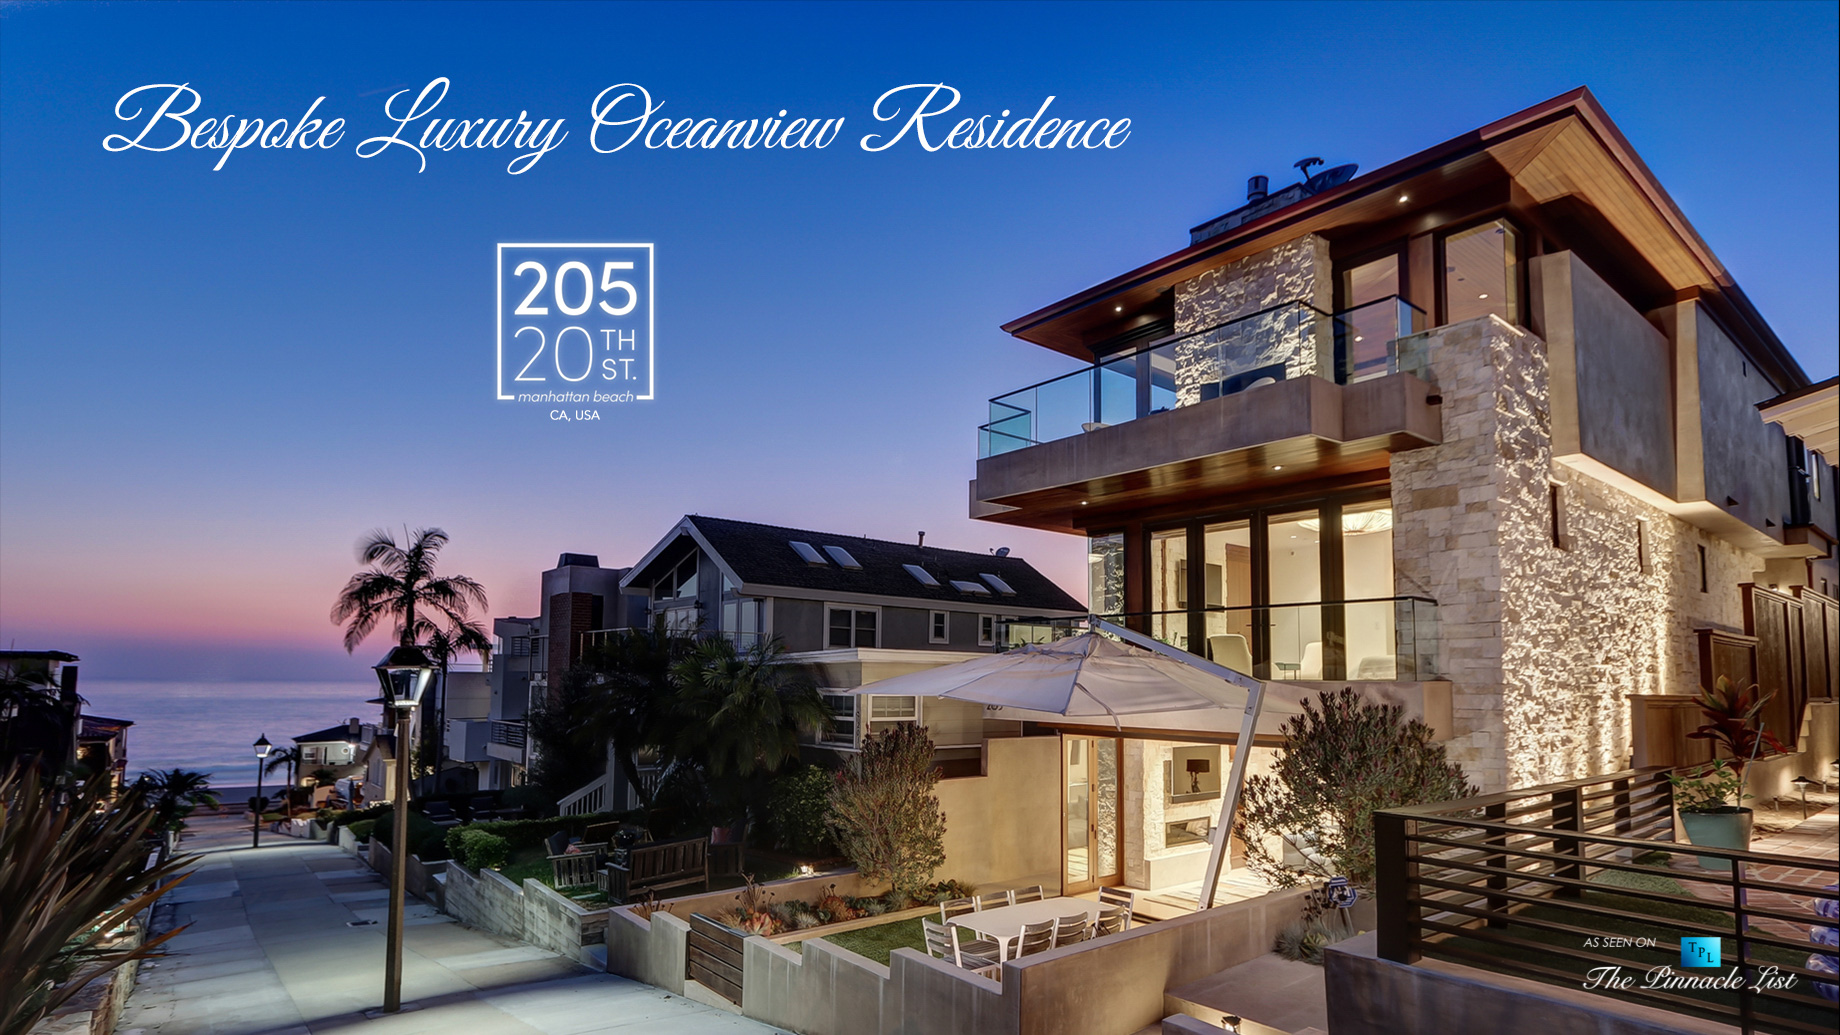 Bespoke Luxury Oceanview Residence - 205 20th St, Manhattan Beach, CA, USA